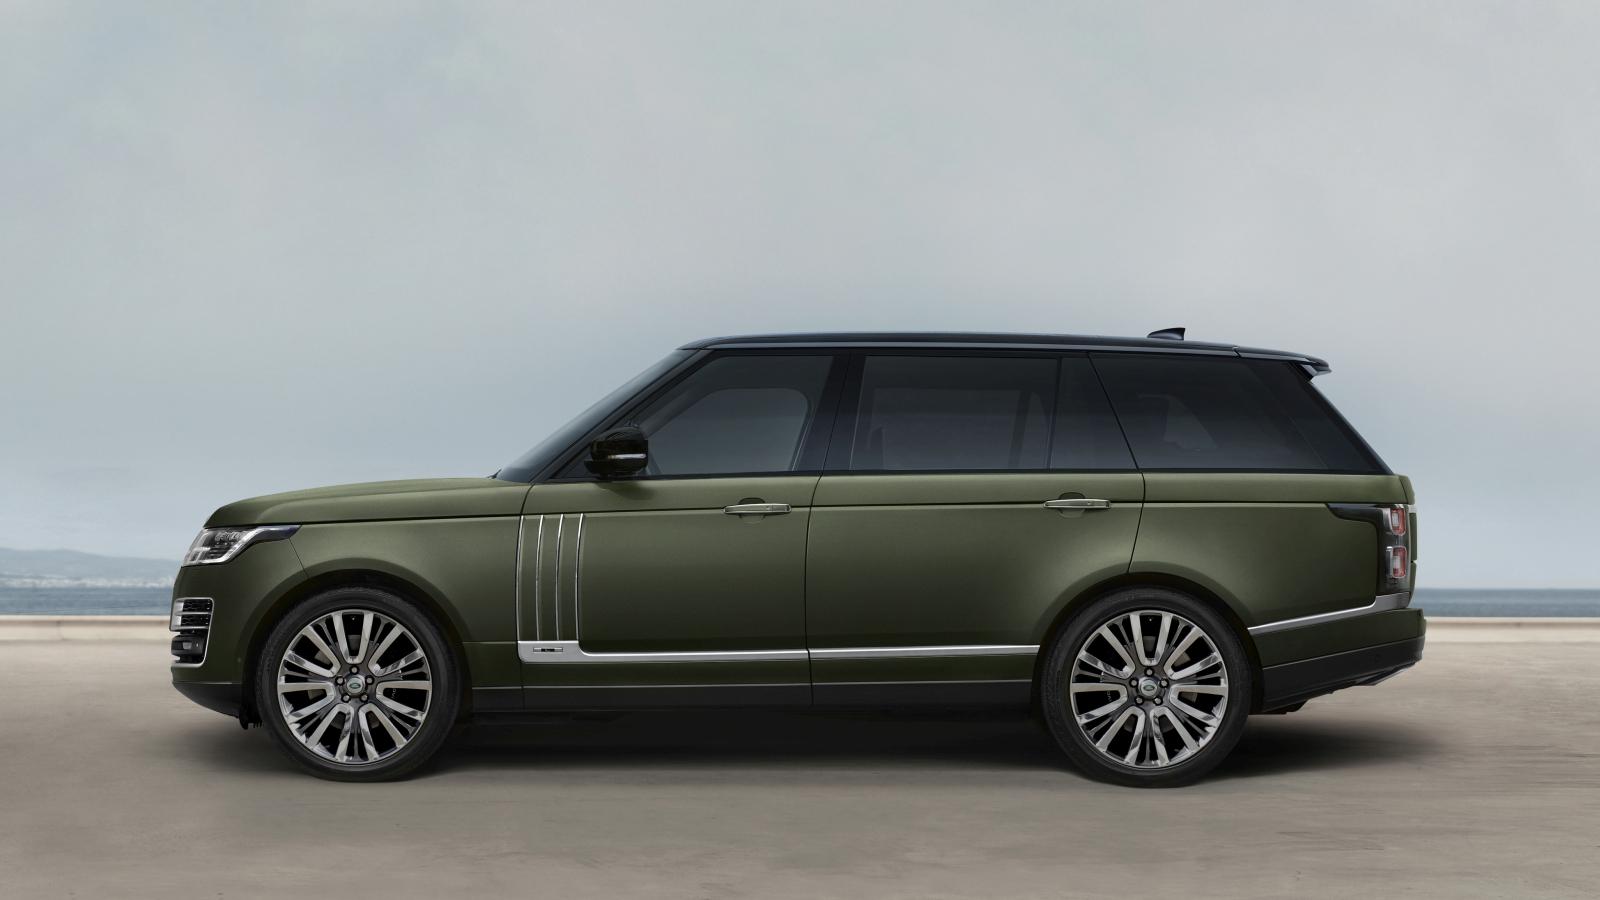 Range Rover SVAutobiography Ultimate edition